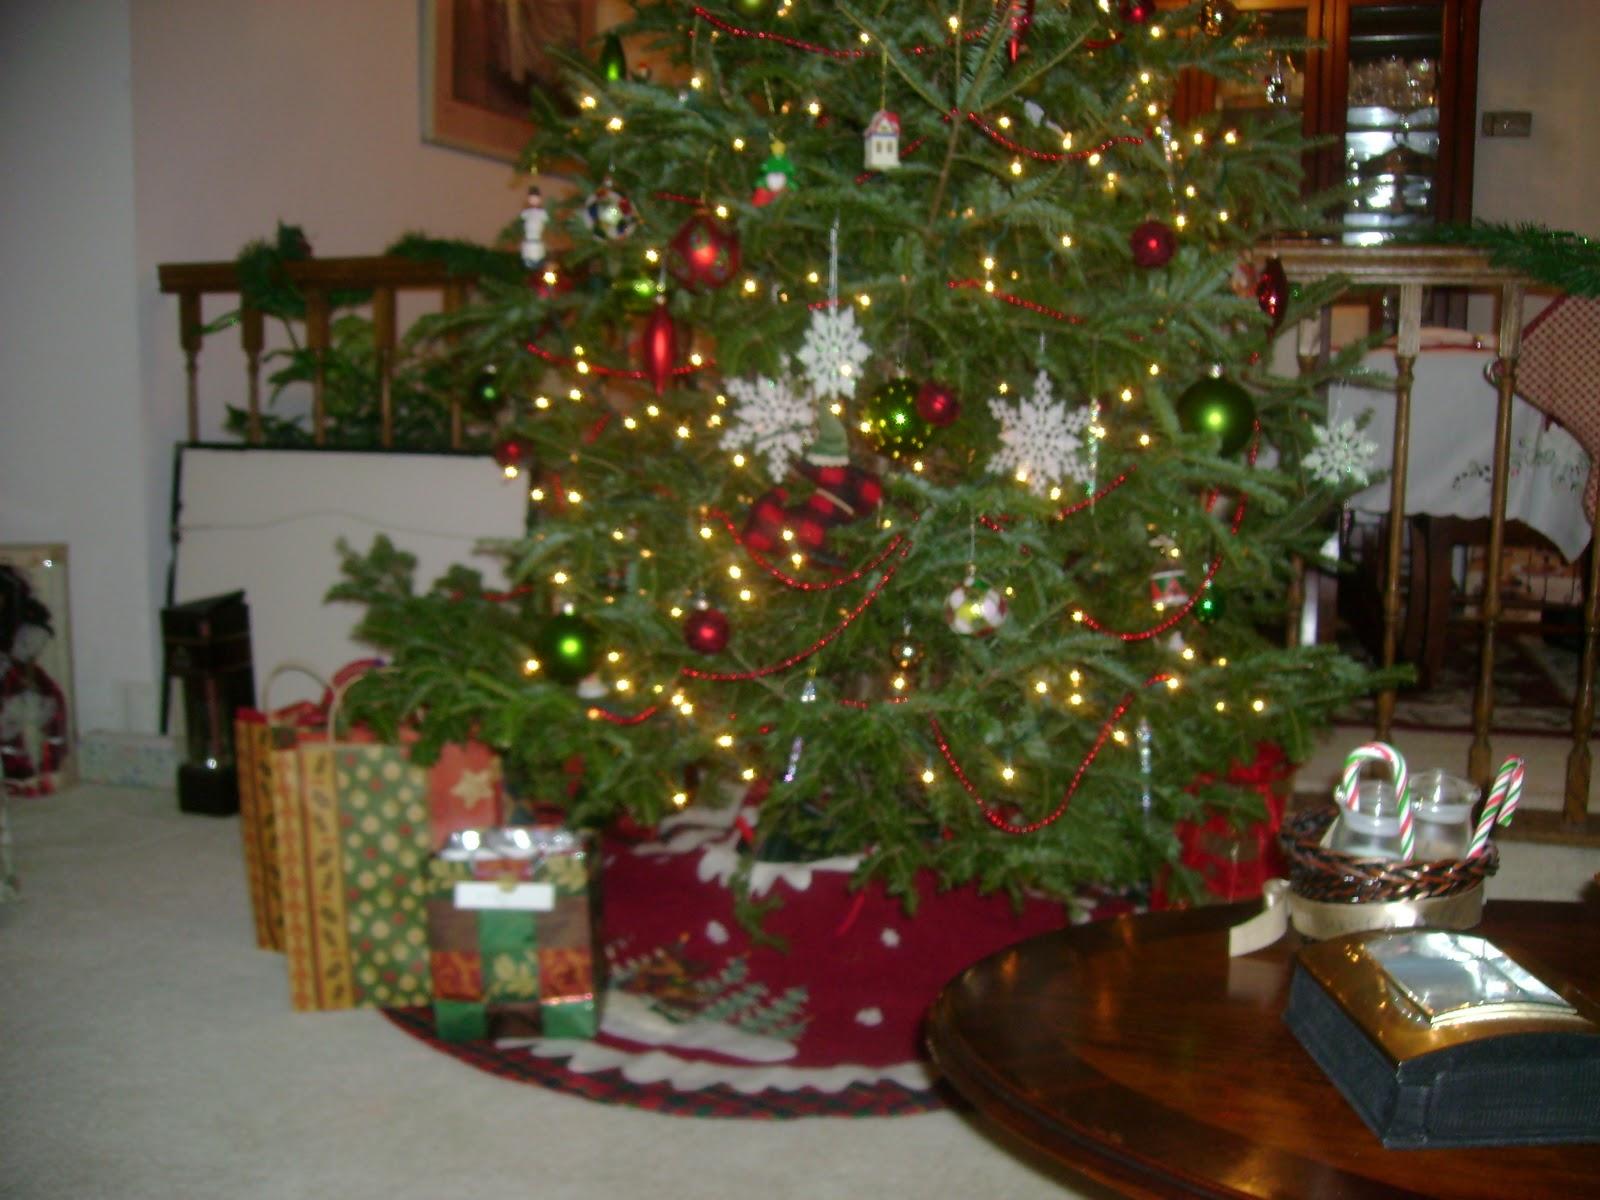 Signature Chic: Signature Christmas Tree Decorating Ideas